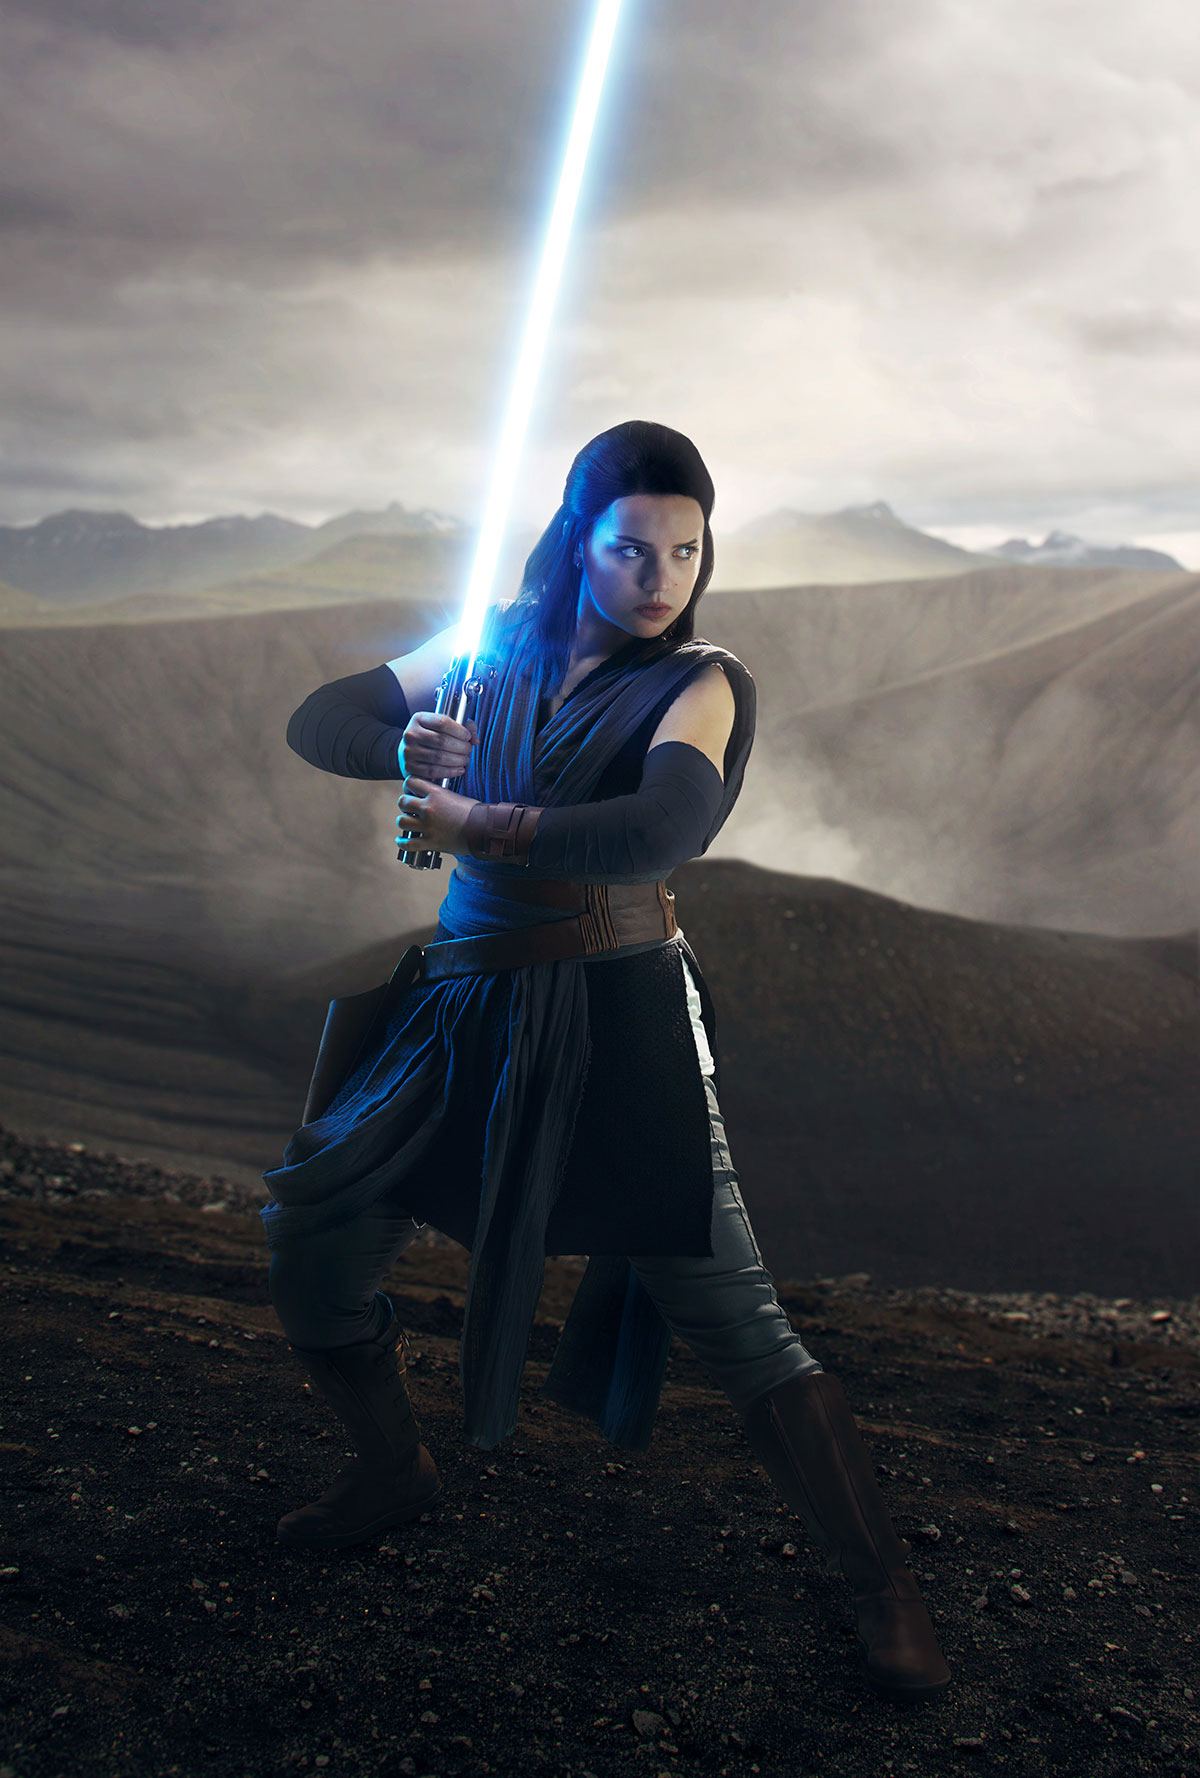 Arthur Sayanoff Rey Star Wars 11 09